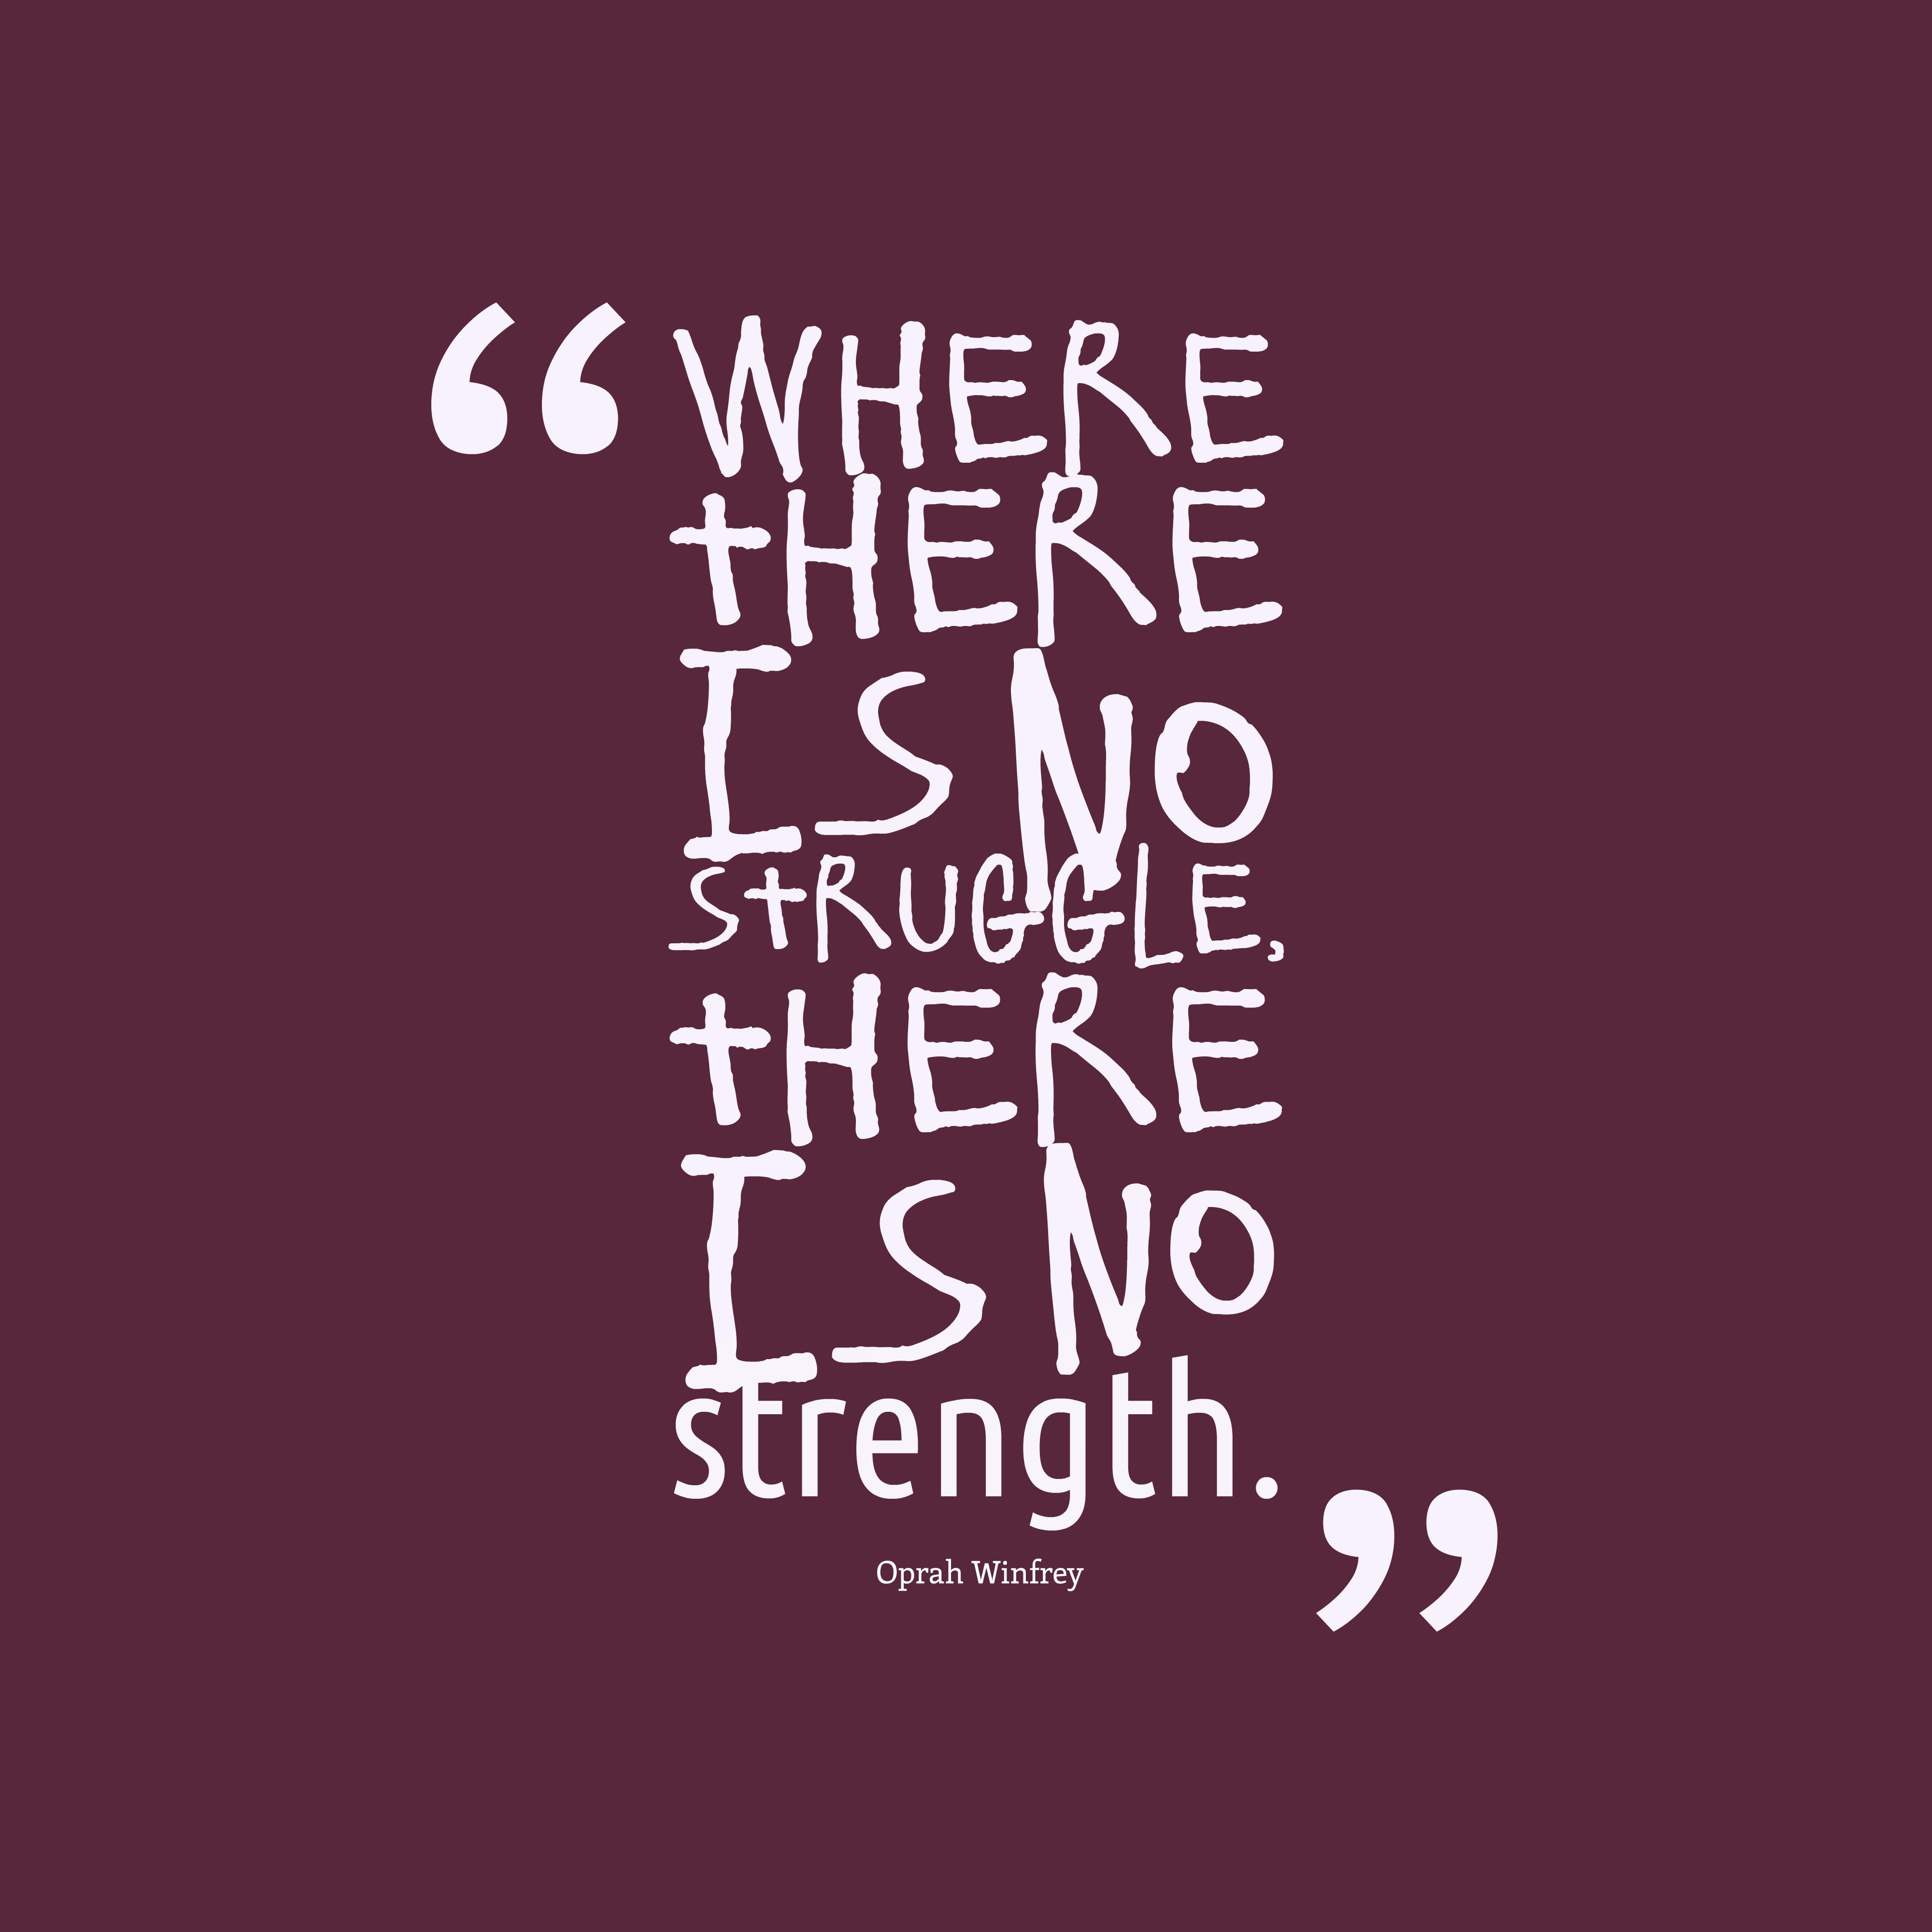 Oprah Winfrey Quotes Oprah Winfrey Quotes And Sayingquotesgram  Motivation  .